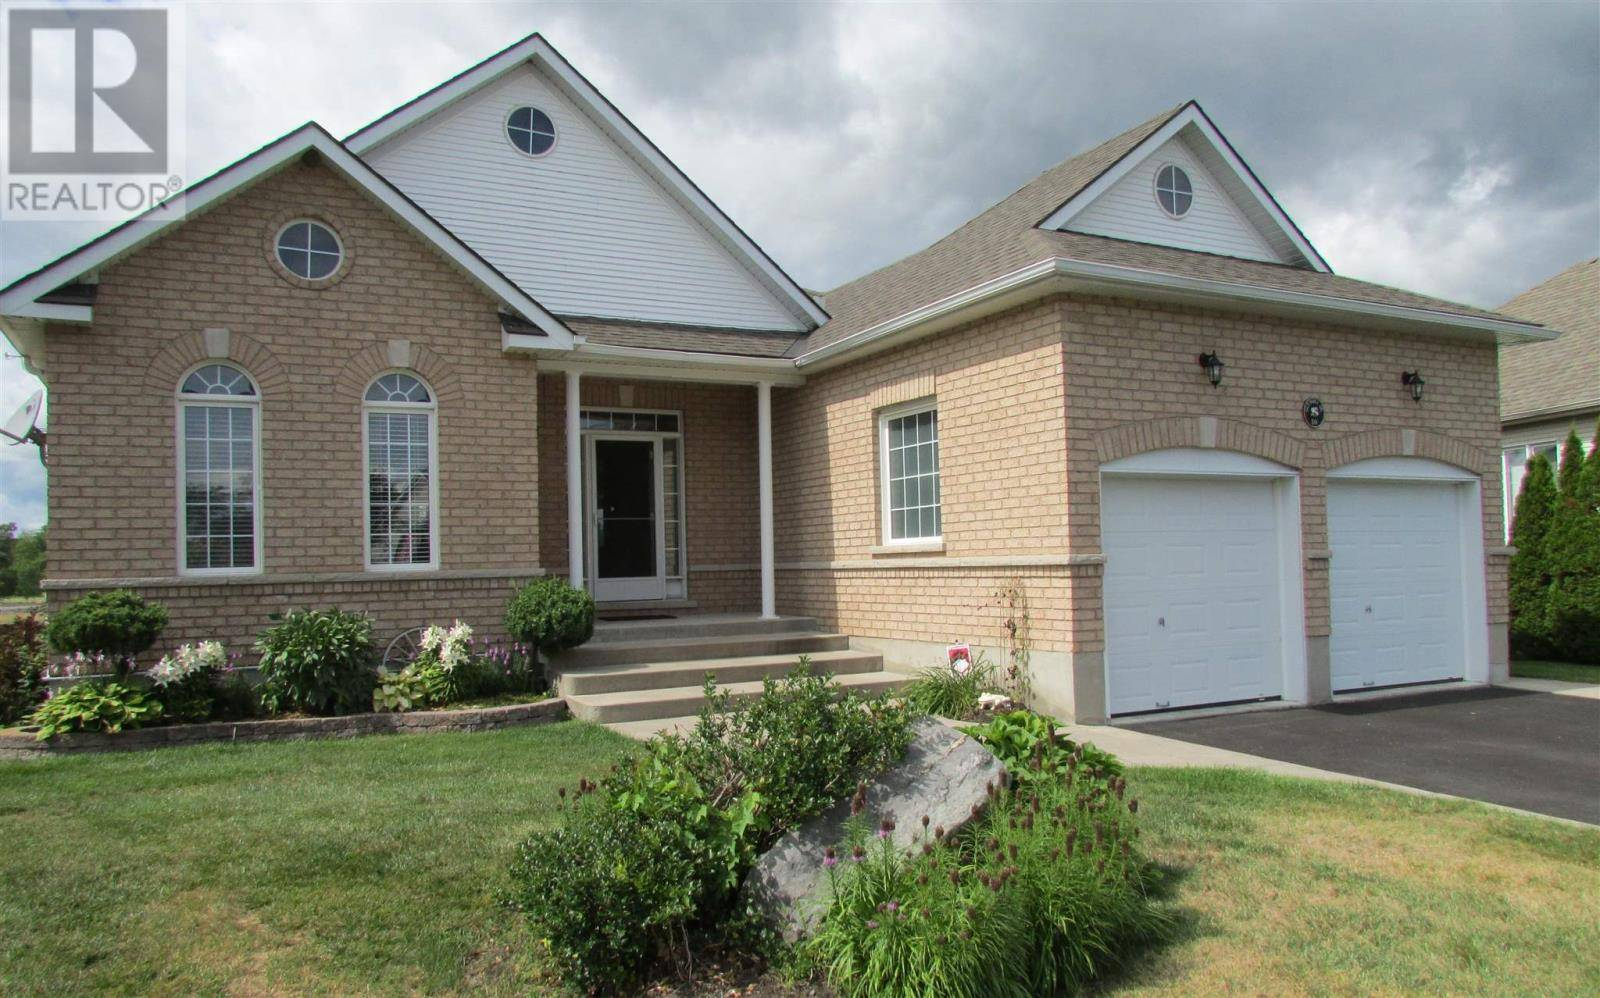 House for sale at 50 Glenora Dr Bath Ontario - MLS: K19005197